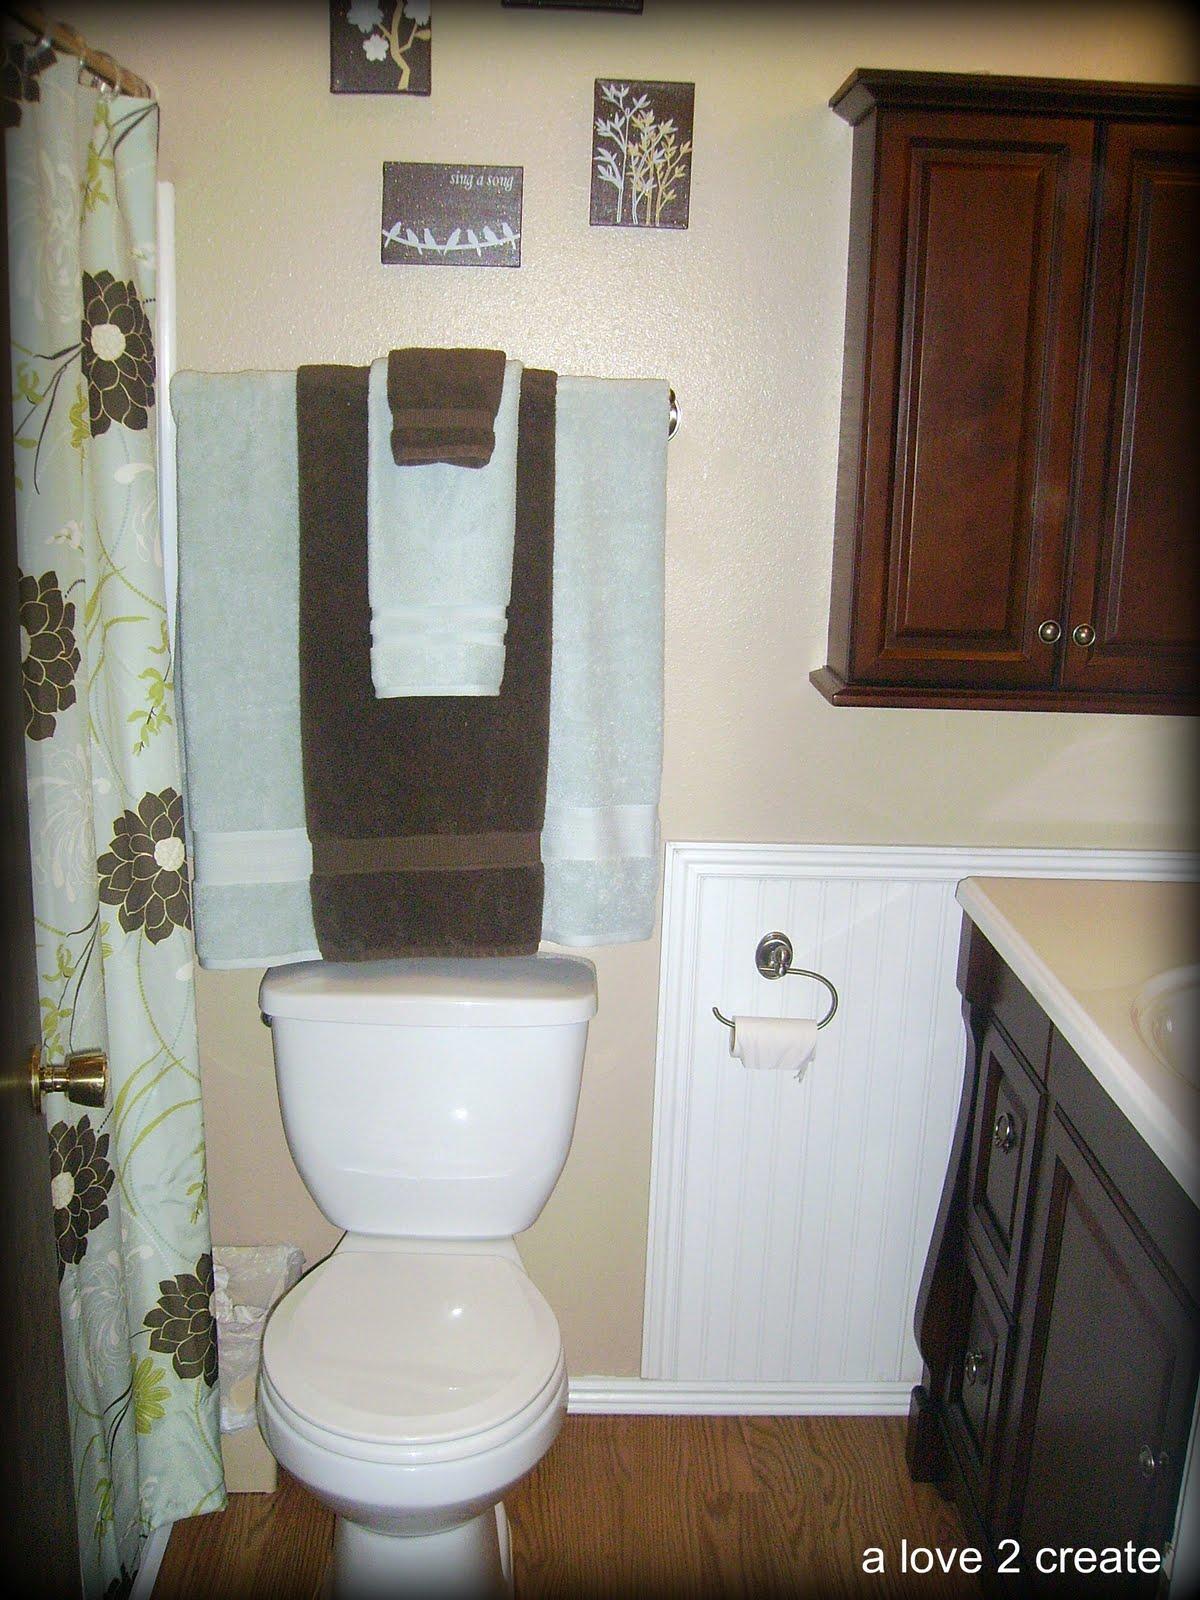 Bathroom Canvas Art: A Love To Create: My Canvas Art...in The Bathroom